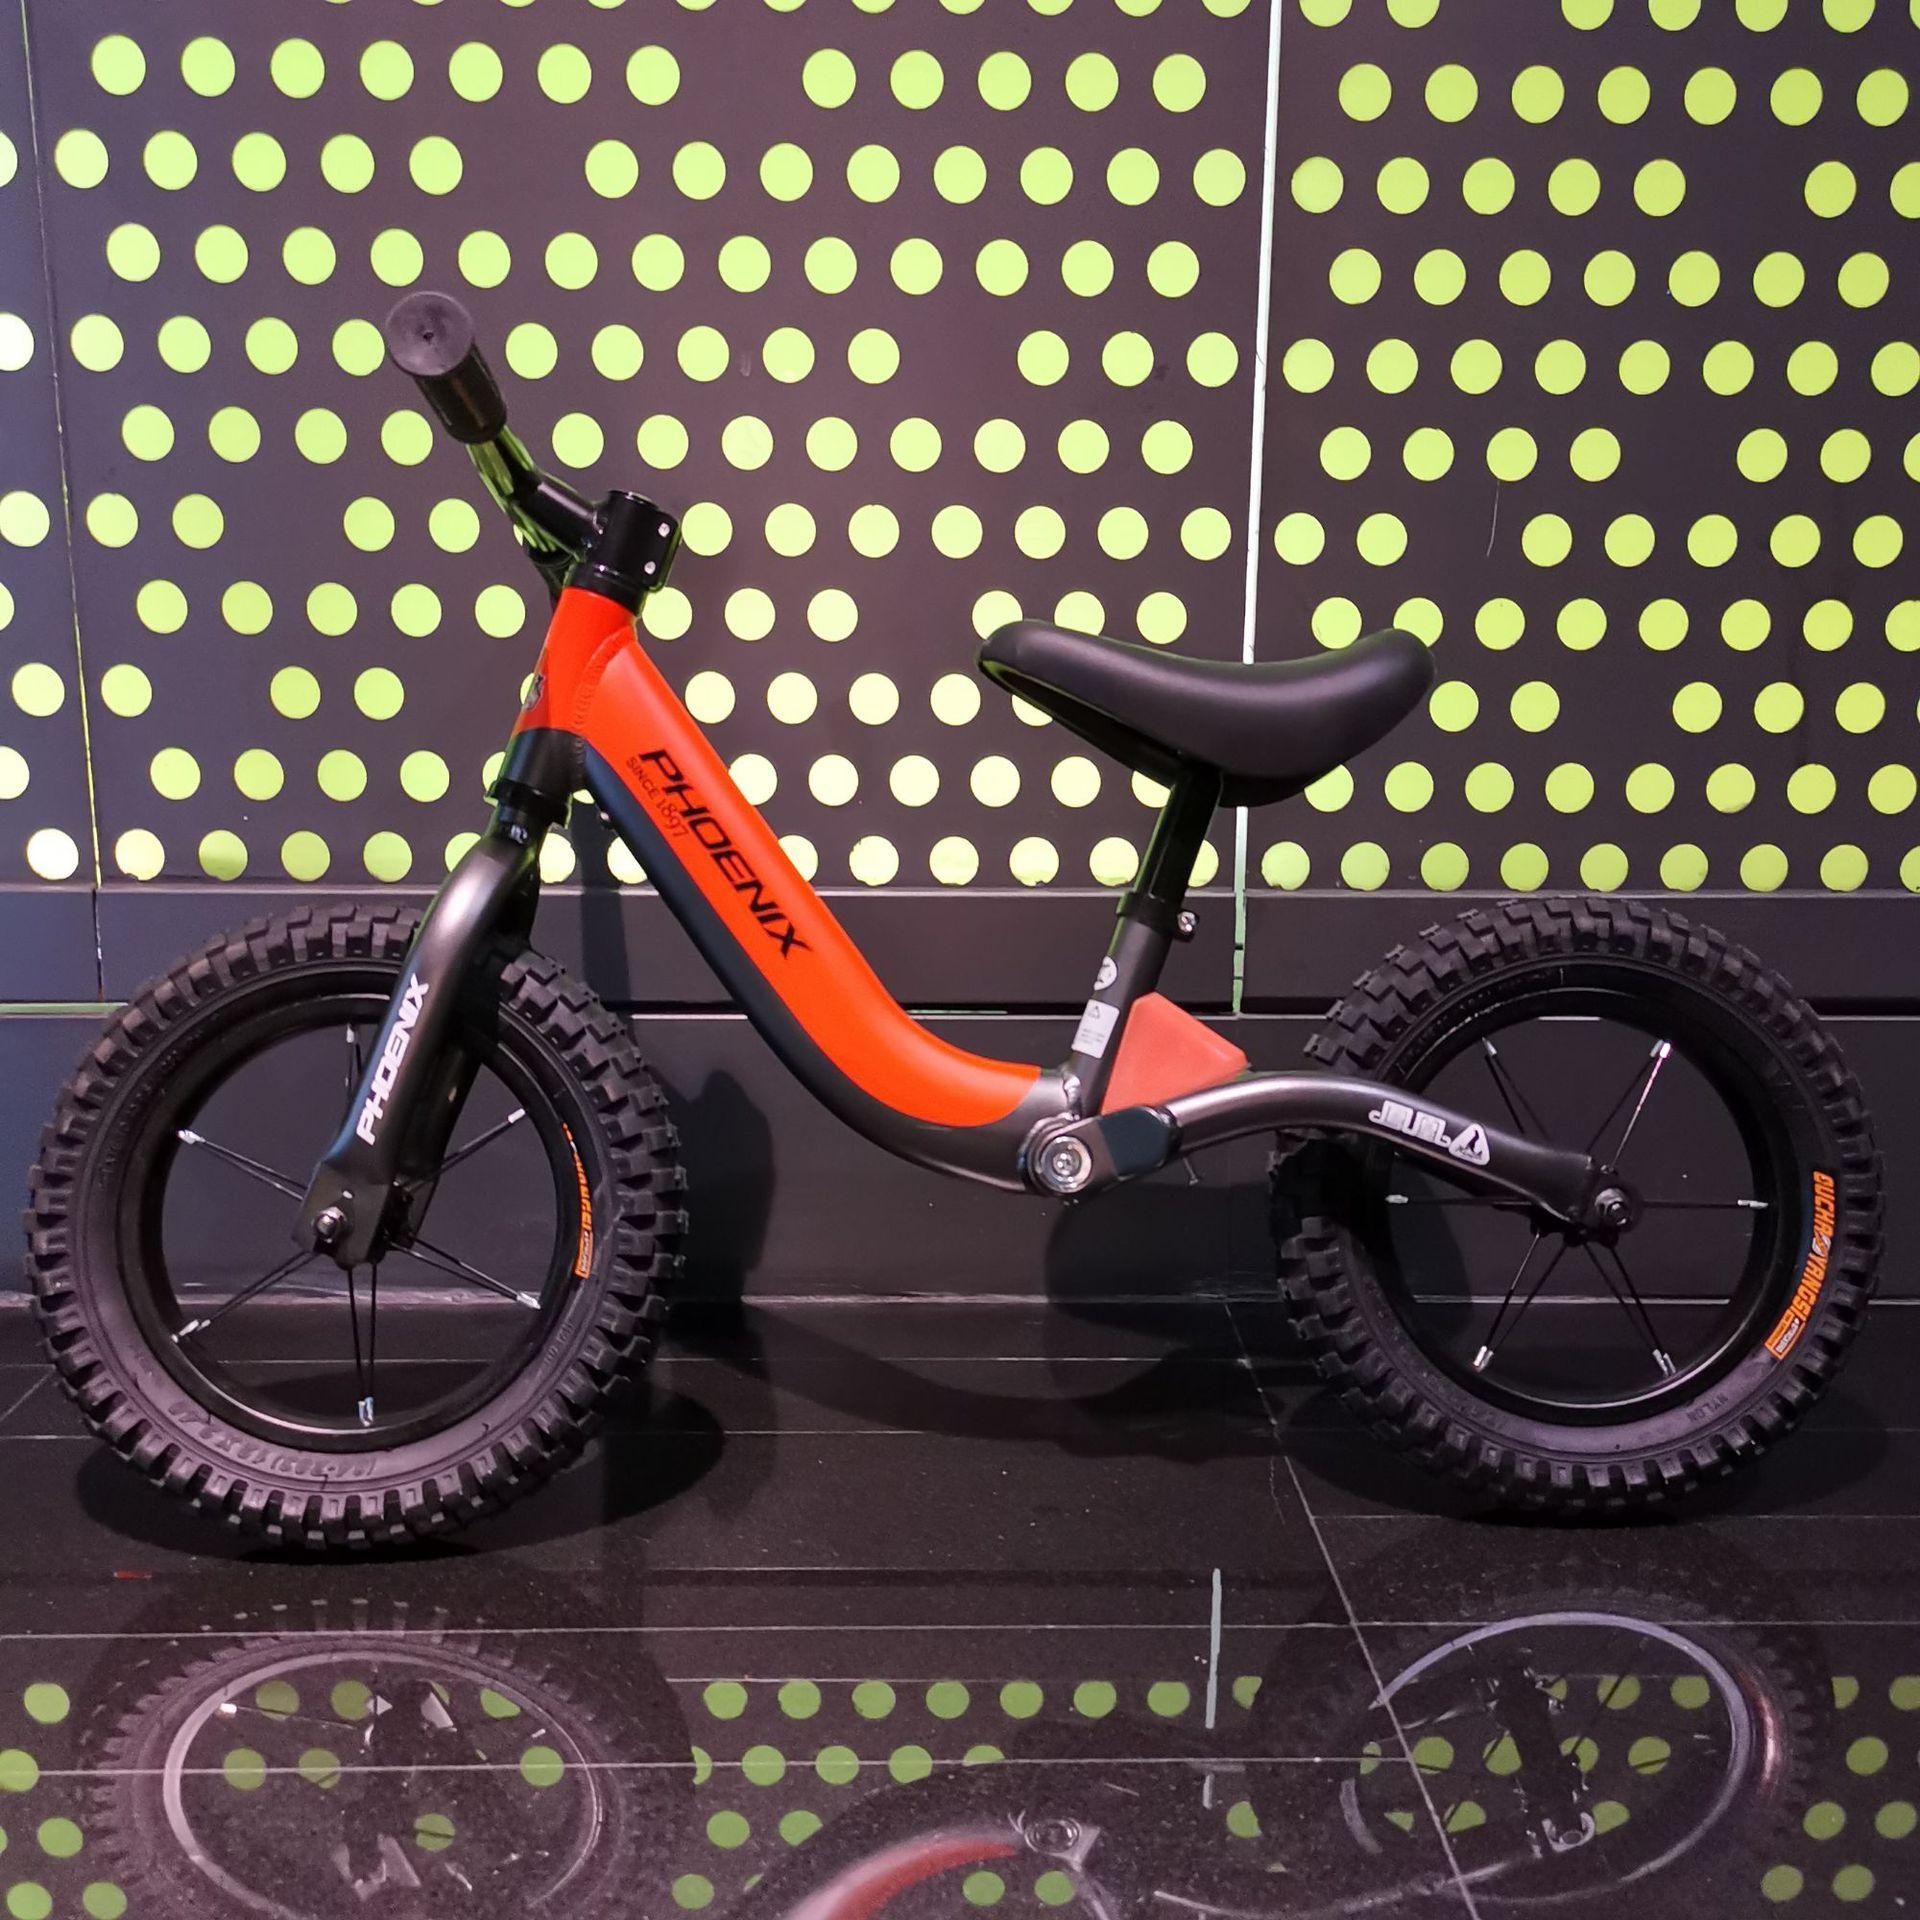 Phoenix 12 Inch Aluminum Balance Bike Toddler No Pedals For 2 – 6 Year Old – Orange, Blue